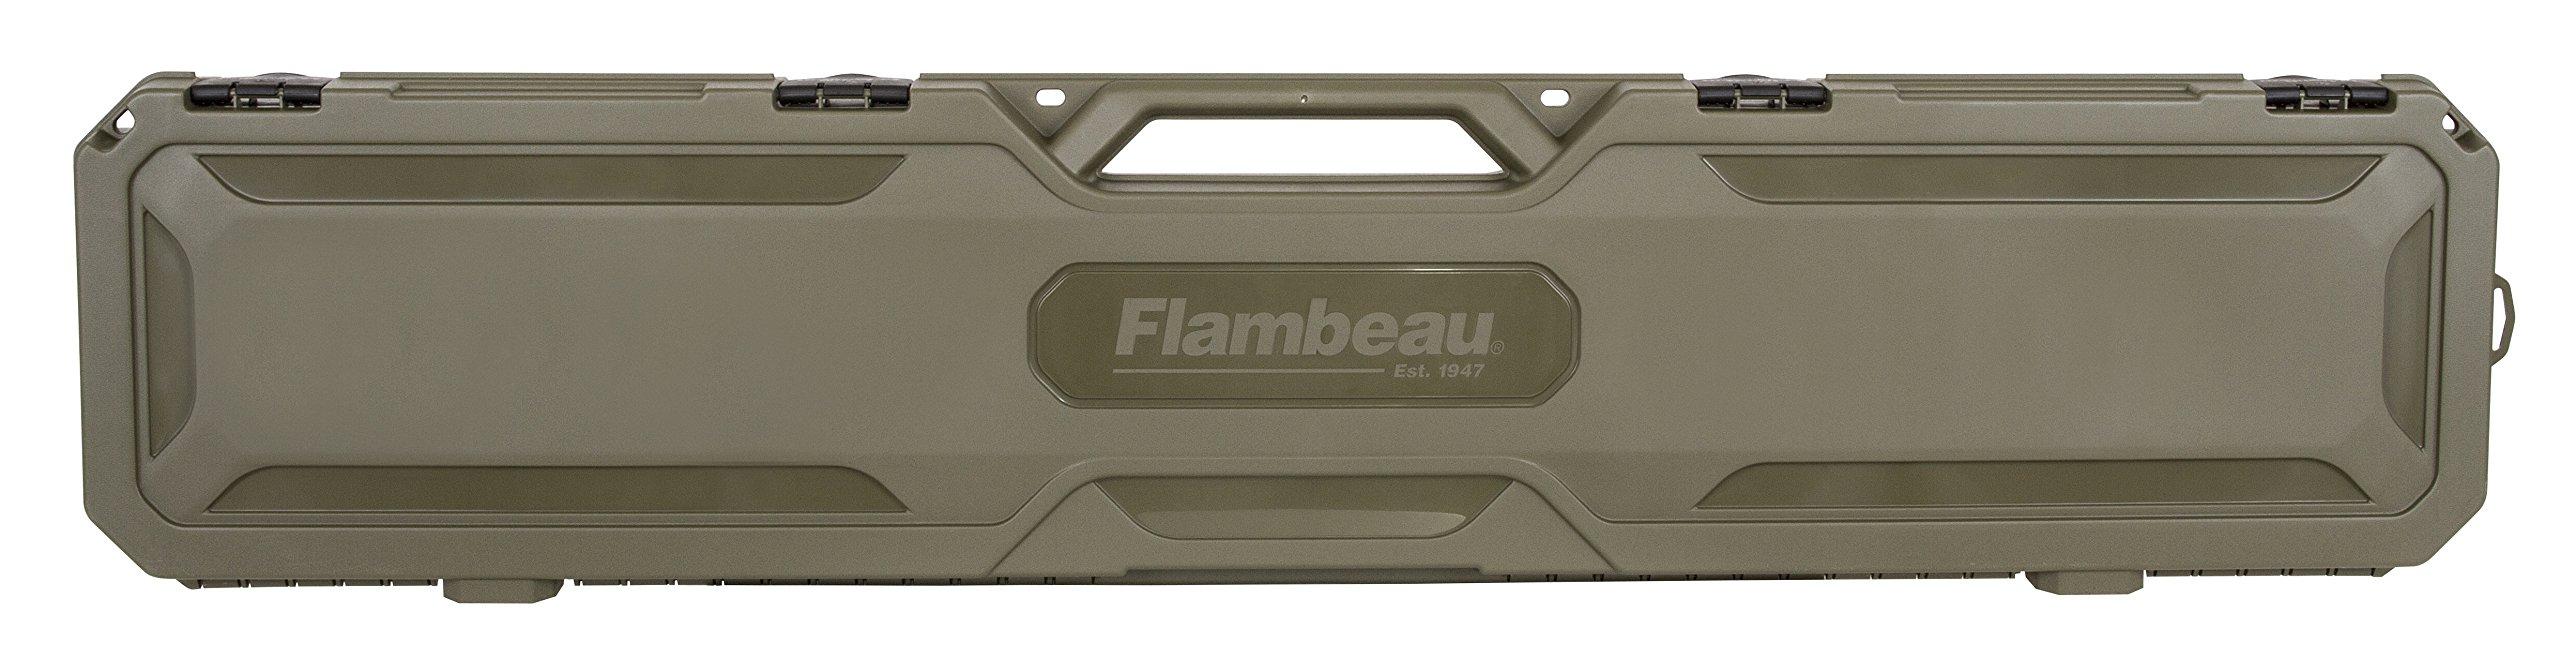 Flambeau Outdoors 6464FS Safe Shot Express Gun Case, X-Large by Flambeau Outdoors (Image #1)